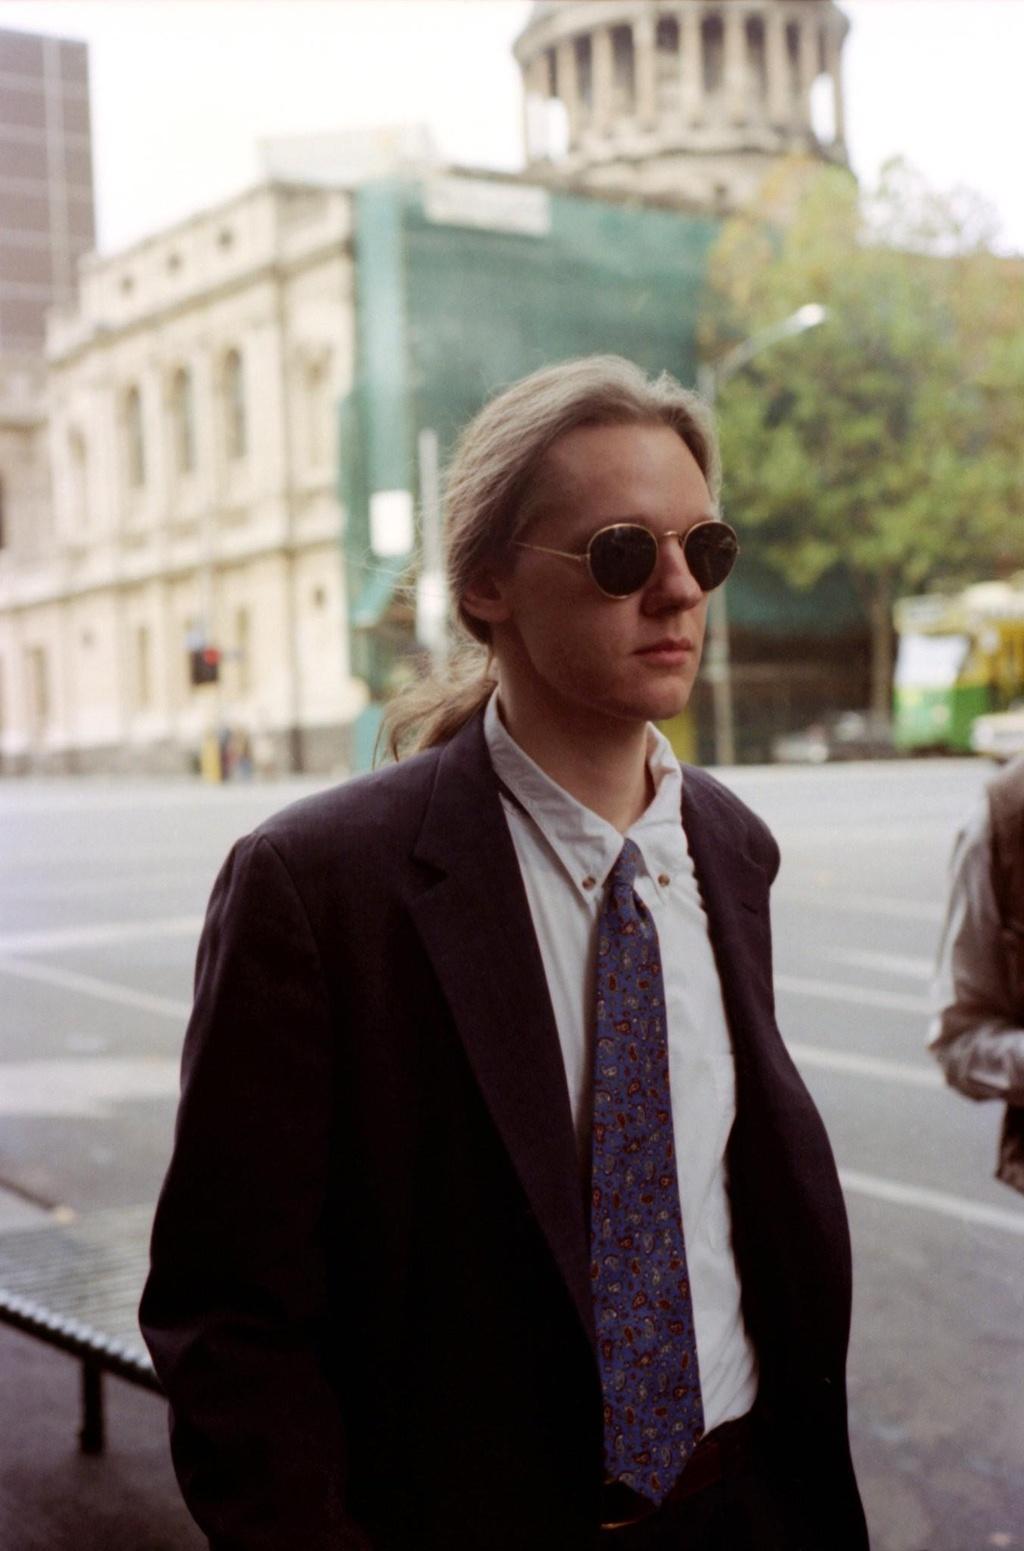 Julian Assange: nguoi hung hay ke lam mat on dinh the gioi anh 3